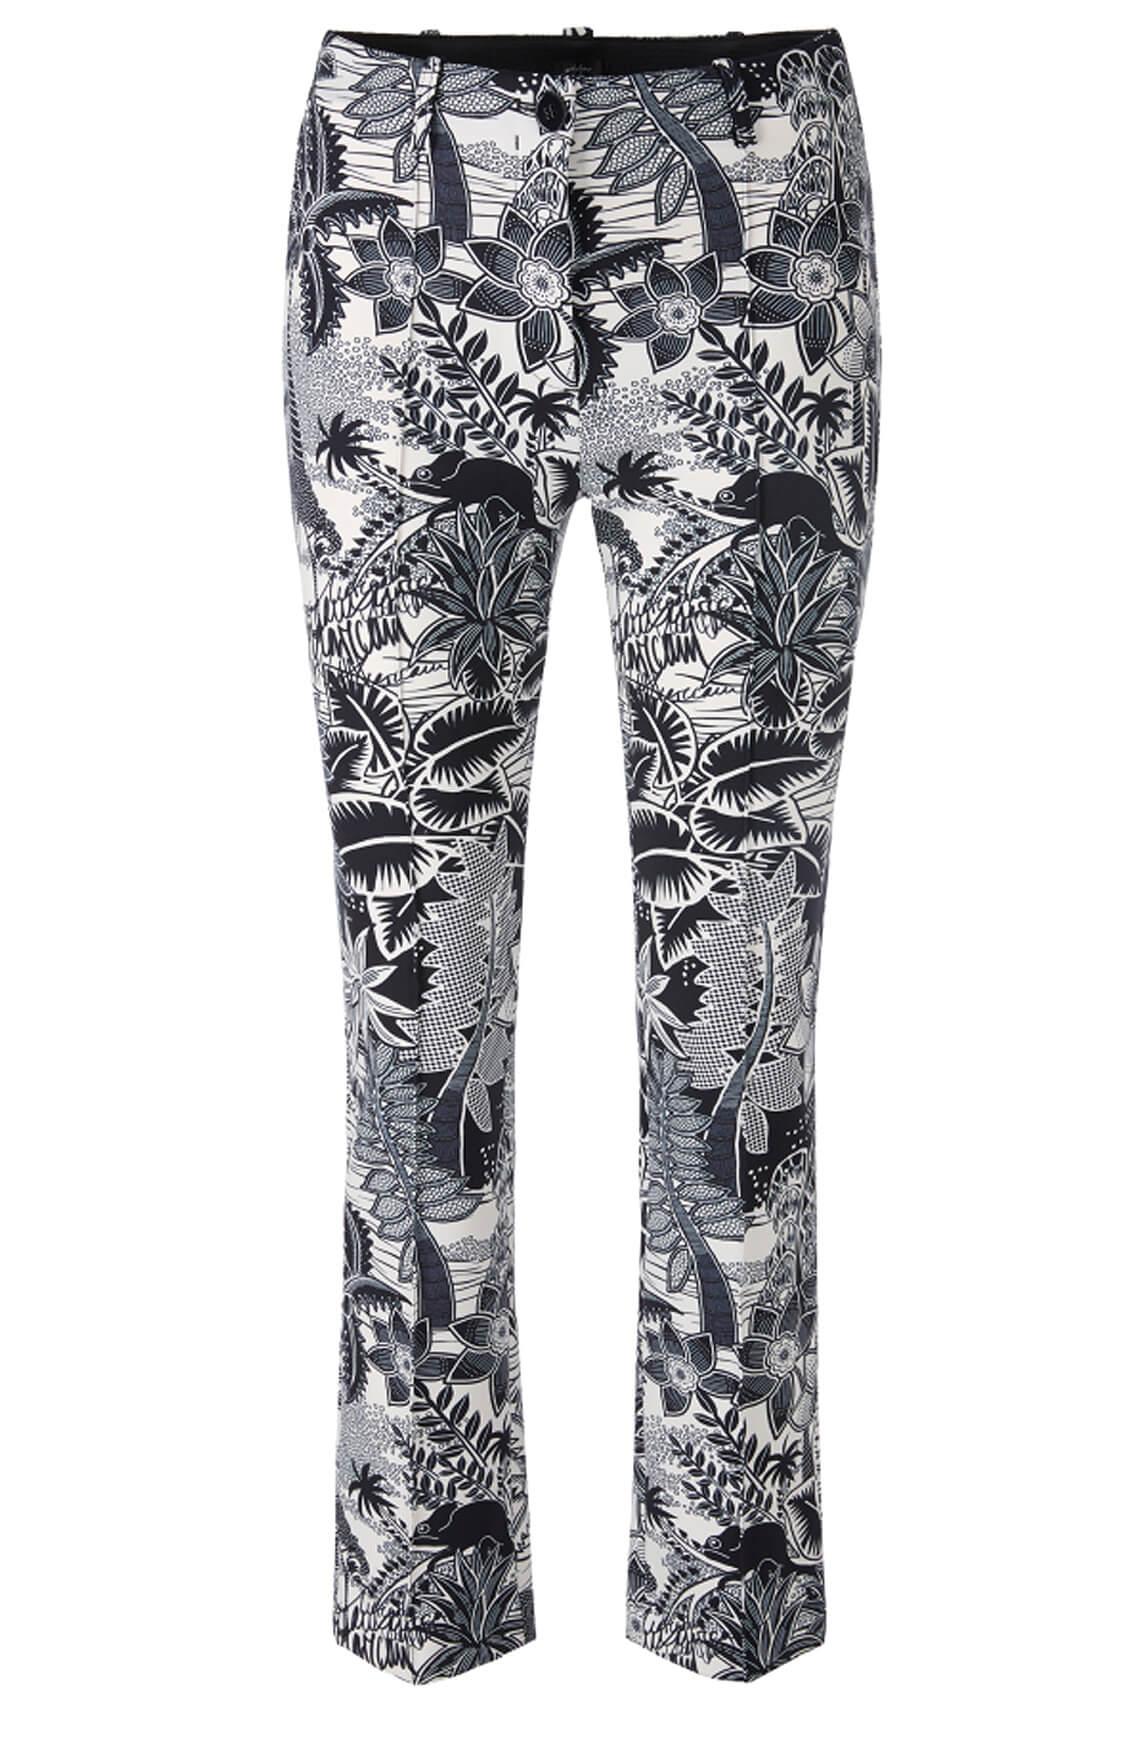 Marccain Dames Pantalon met tropische print Zwart